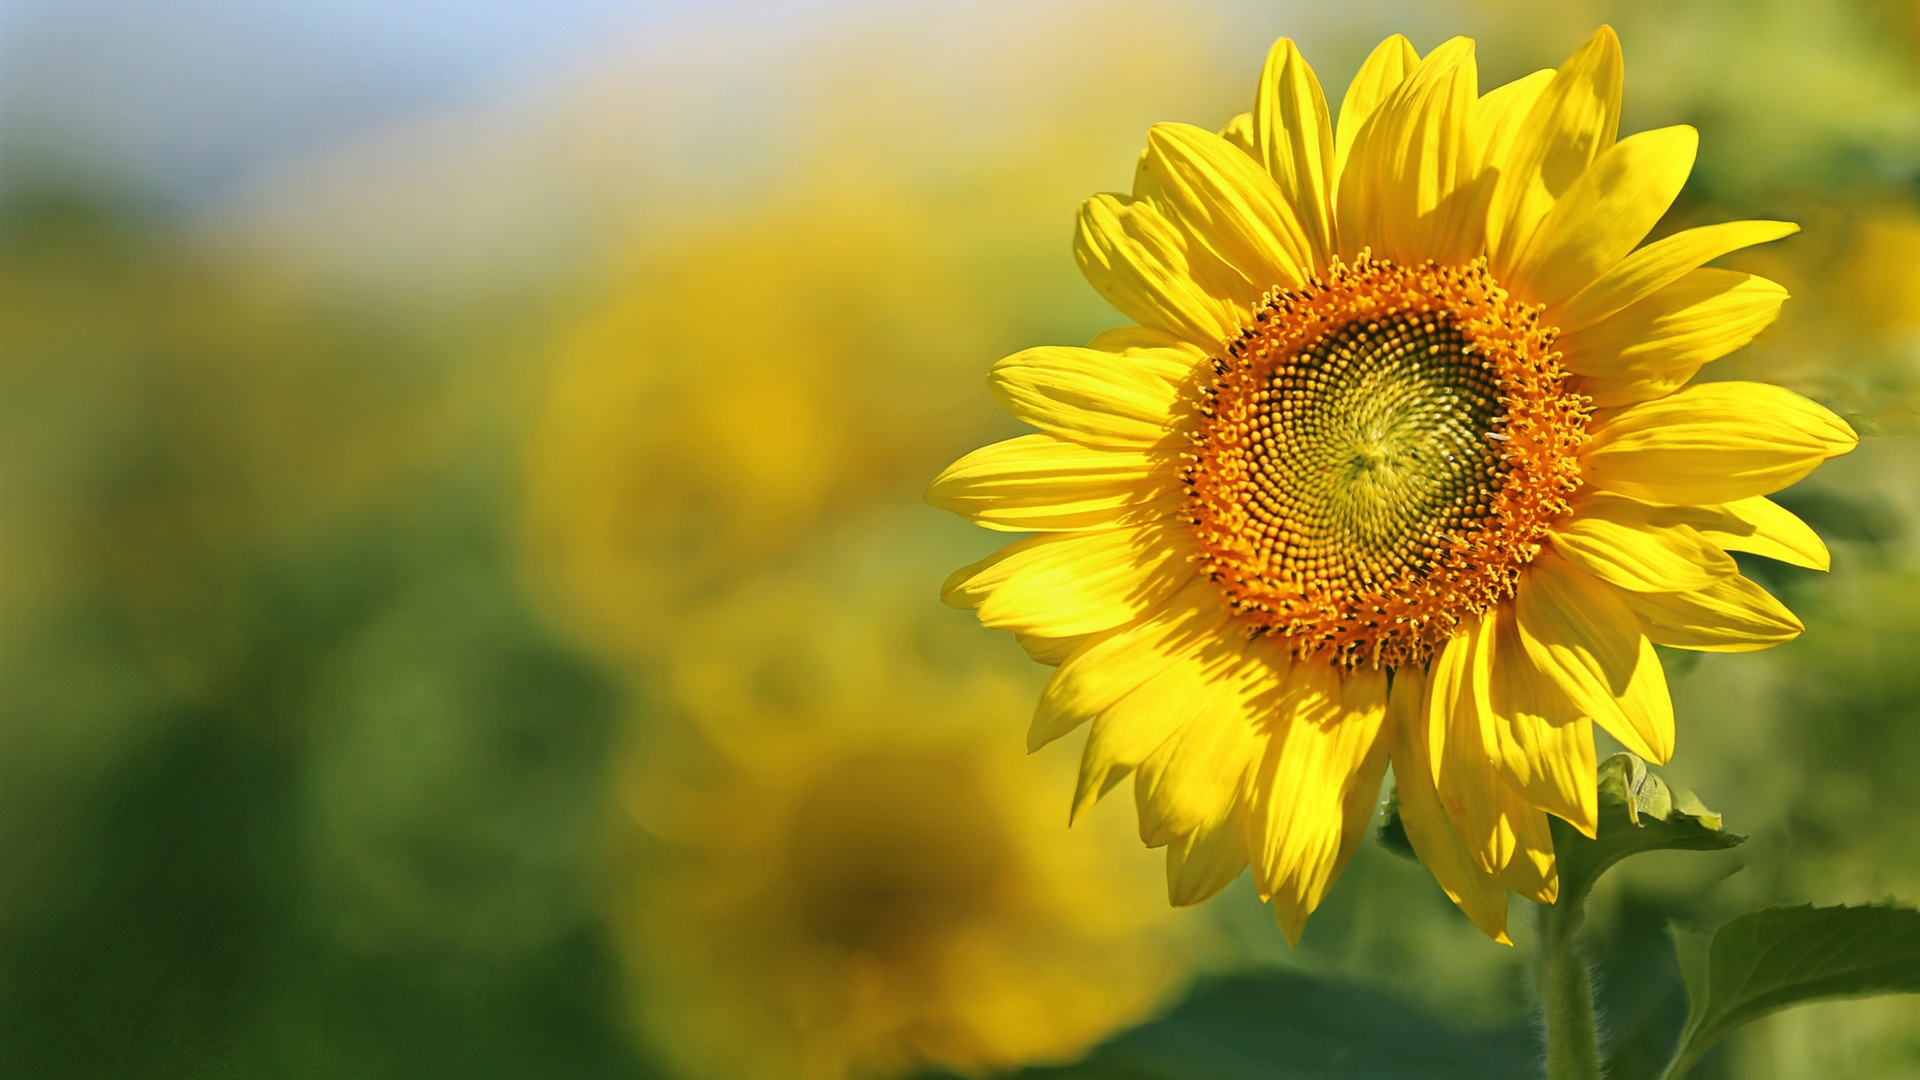 Girasol ptalos amarillos verano fondos de pantalla 1920x1080 girasol ptalos amarillos verano hintergrundbilder 1920x1080 full hd thecheapjerseys Images